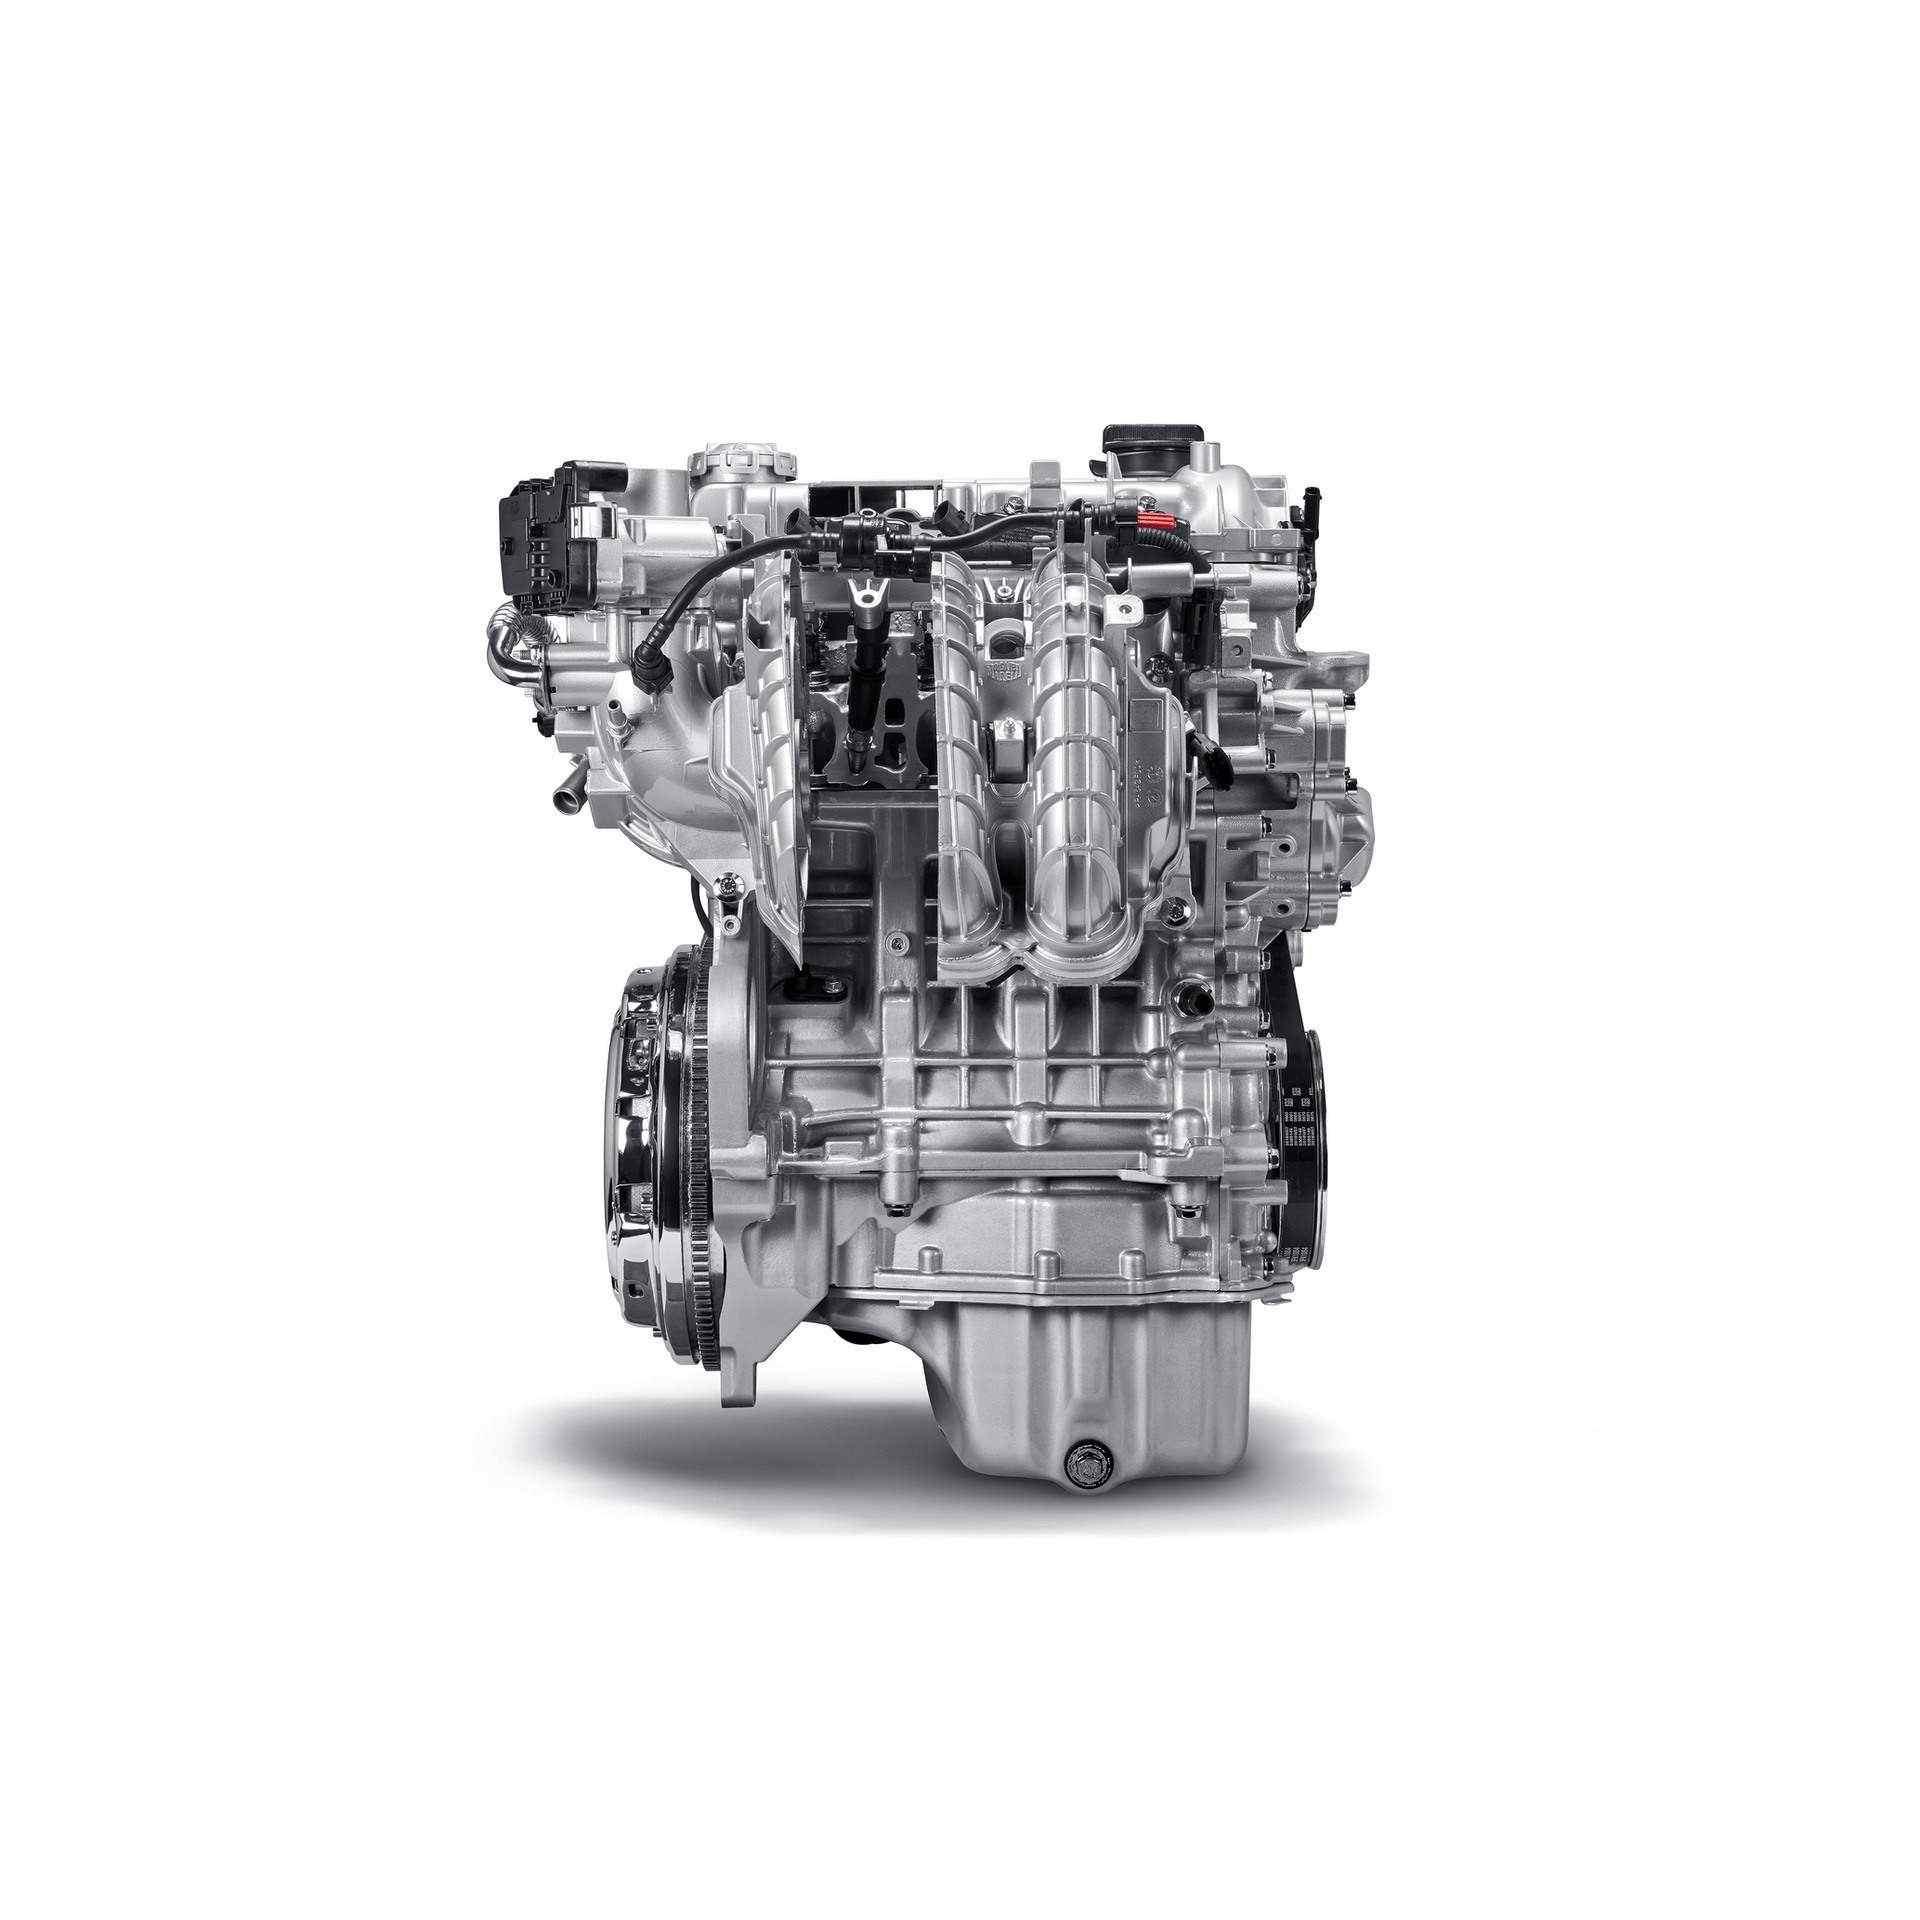 200108_Fiat_Mild-Hybrid-Engine_01